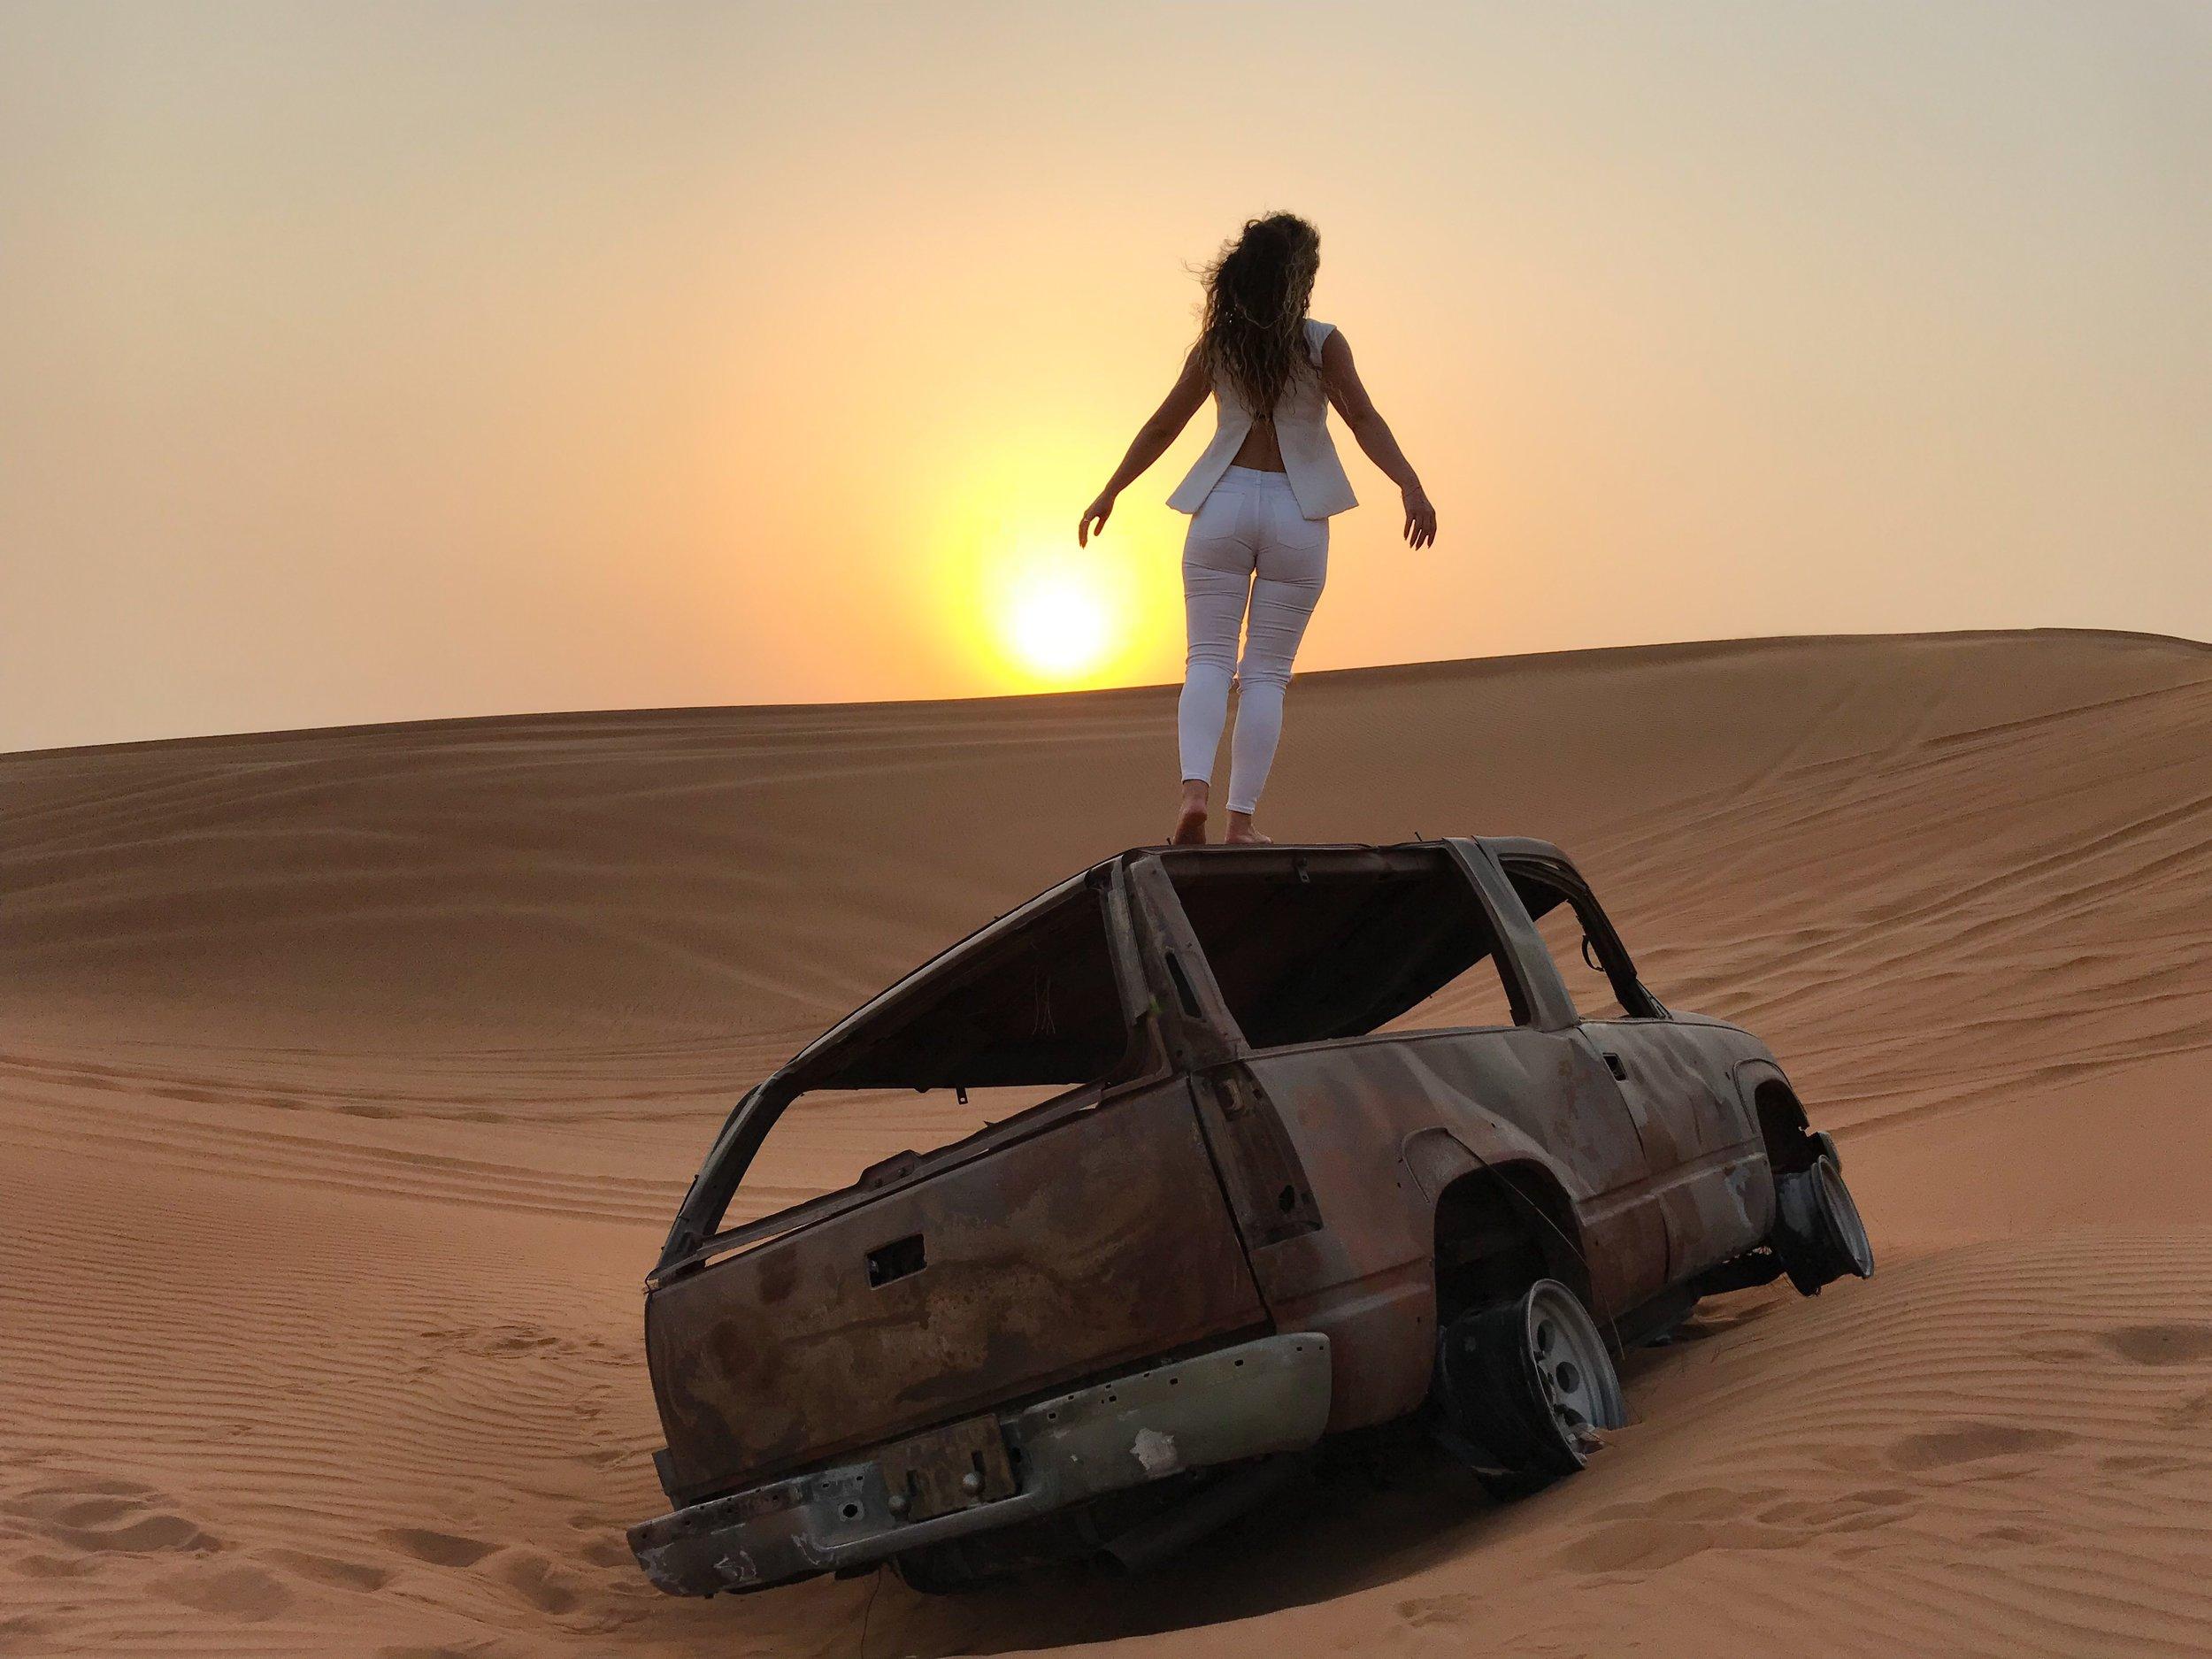 TOUR DUBAI ROYAL SAFARI • DUBAI, UAE PHOTOGRAPHER: ABDUL